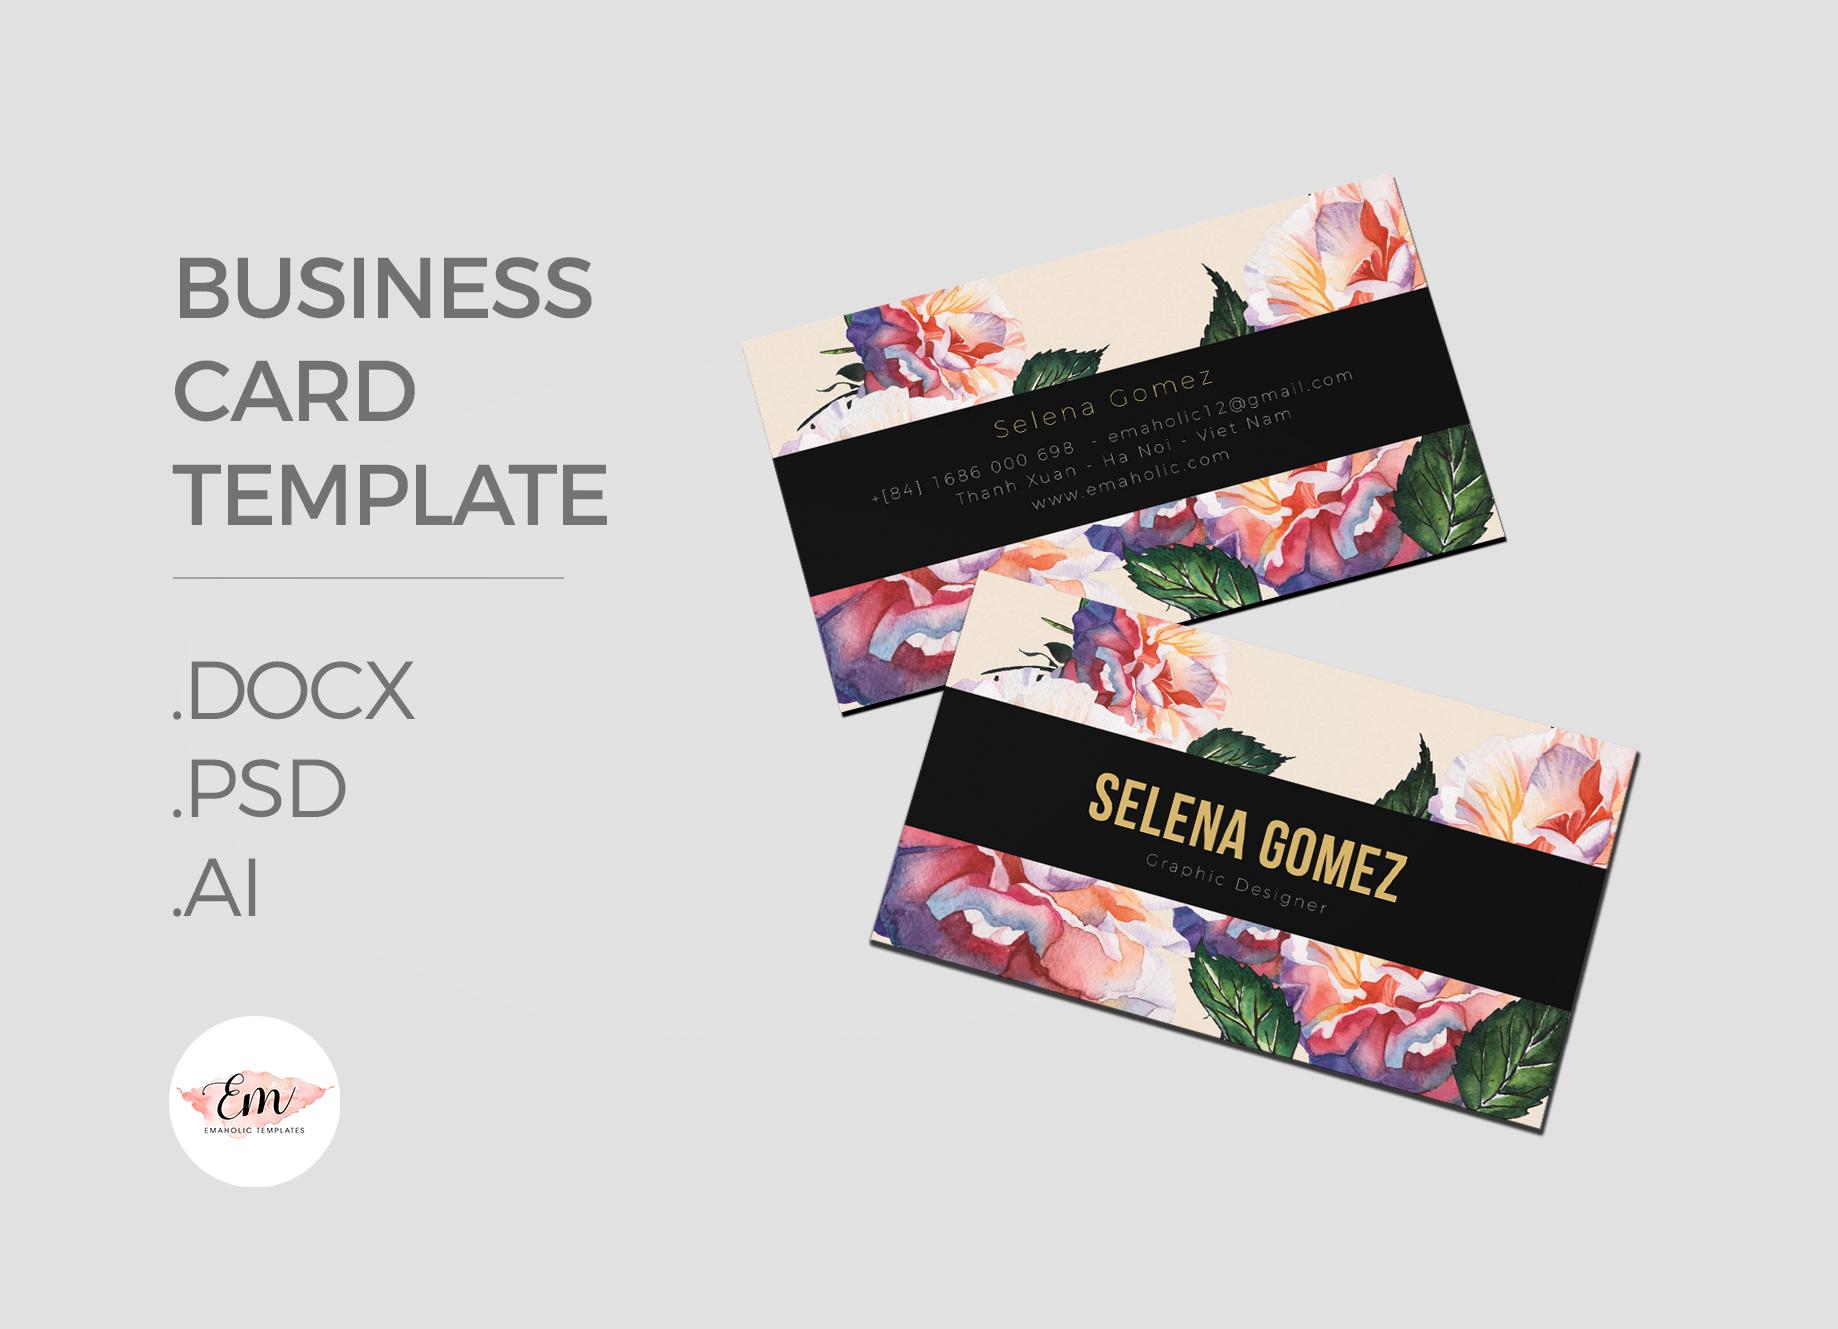 elegant business card template    creative business card    modern card